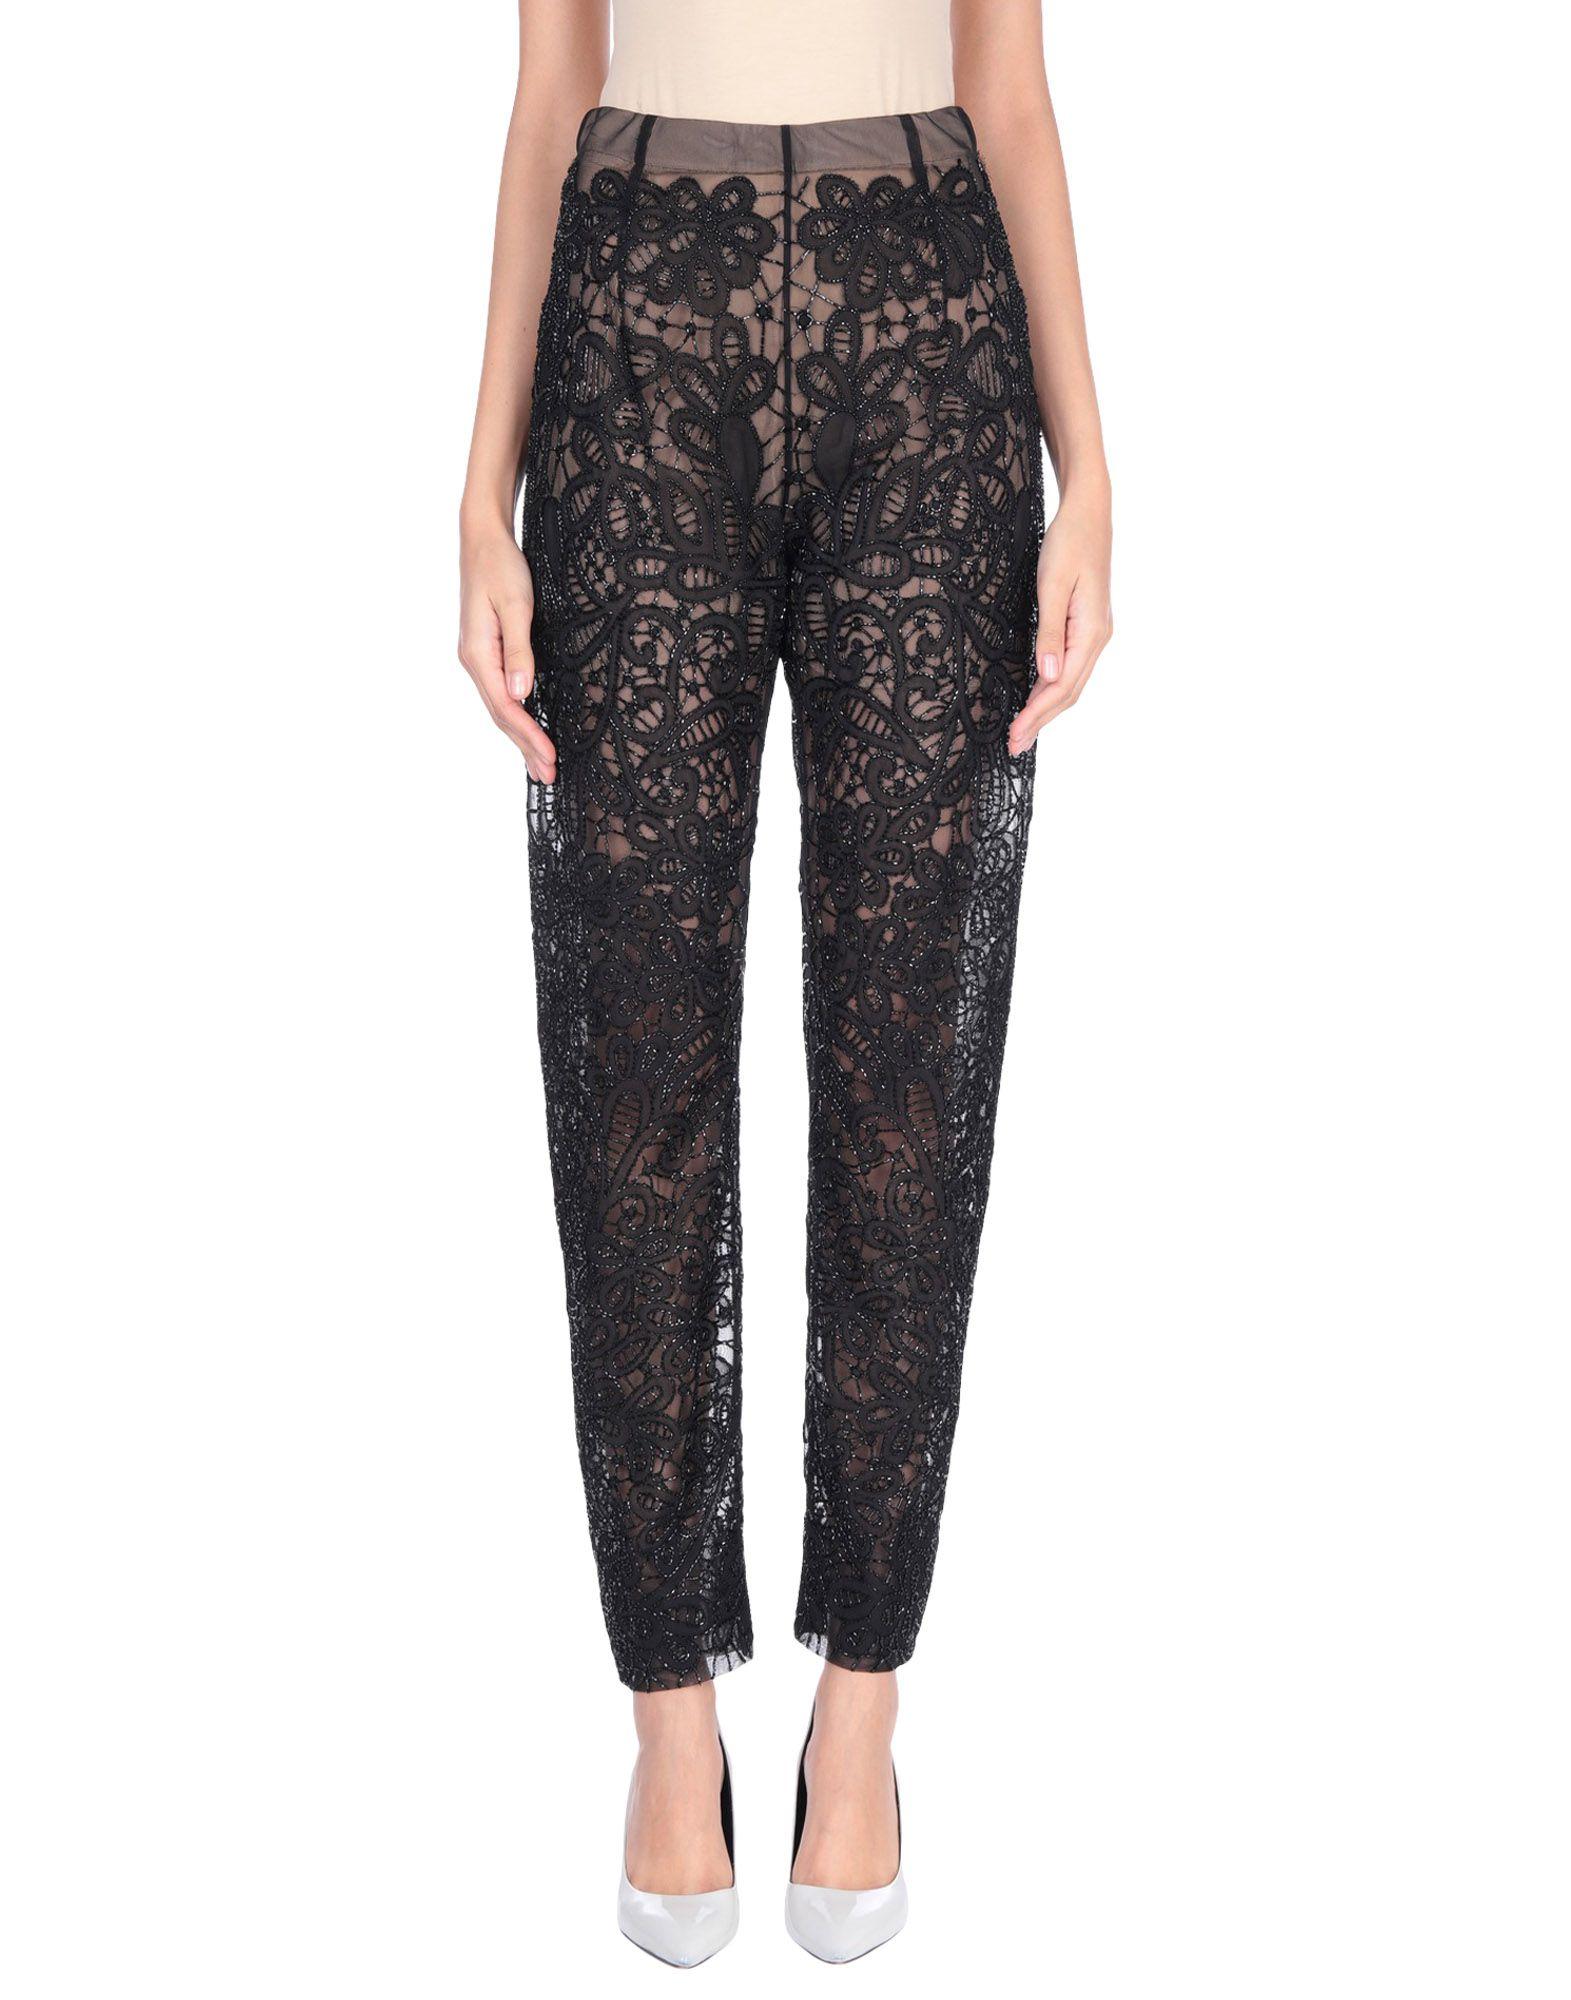 Pantalone Pantalone Mario Dice donna - 13287174PQ  Online-Rabatt